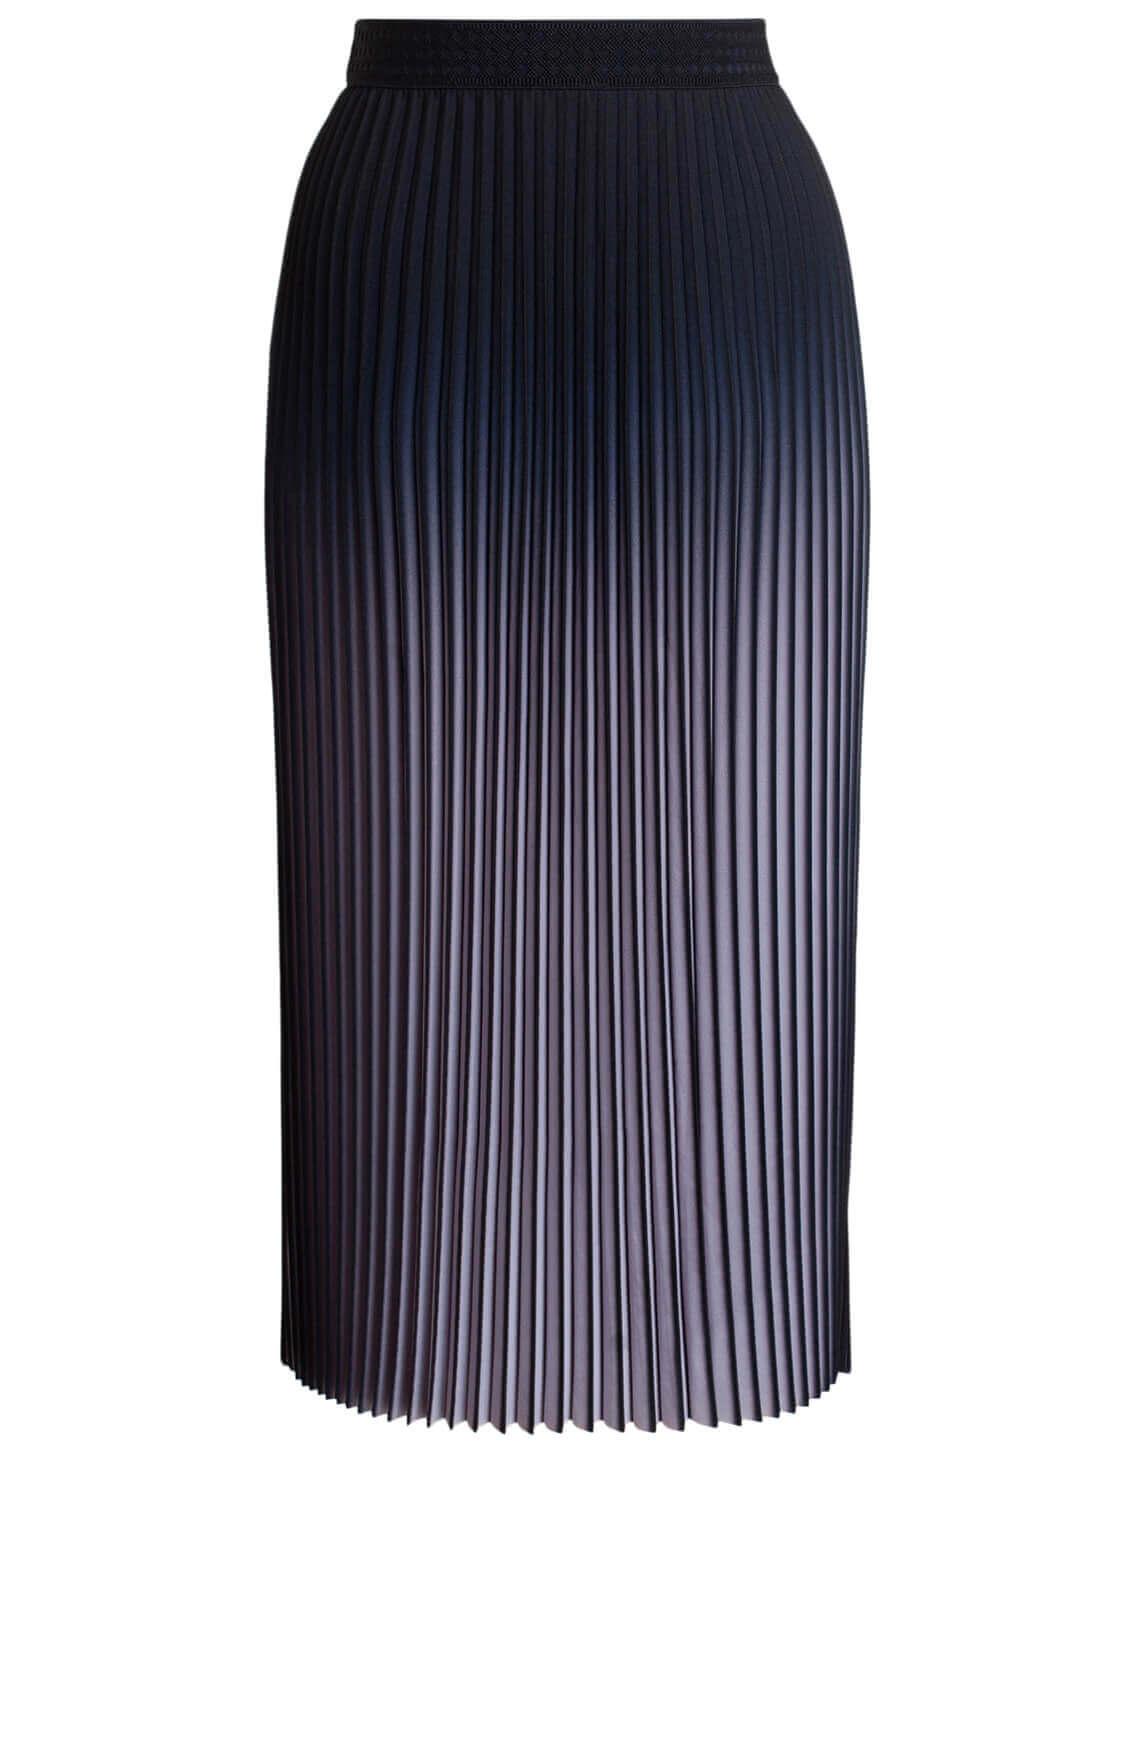 Anna Dames Plissé rok met kleurverloop zwart